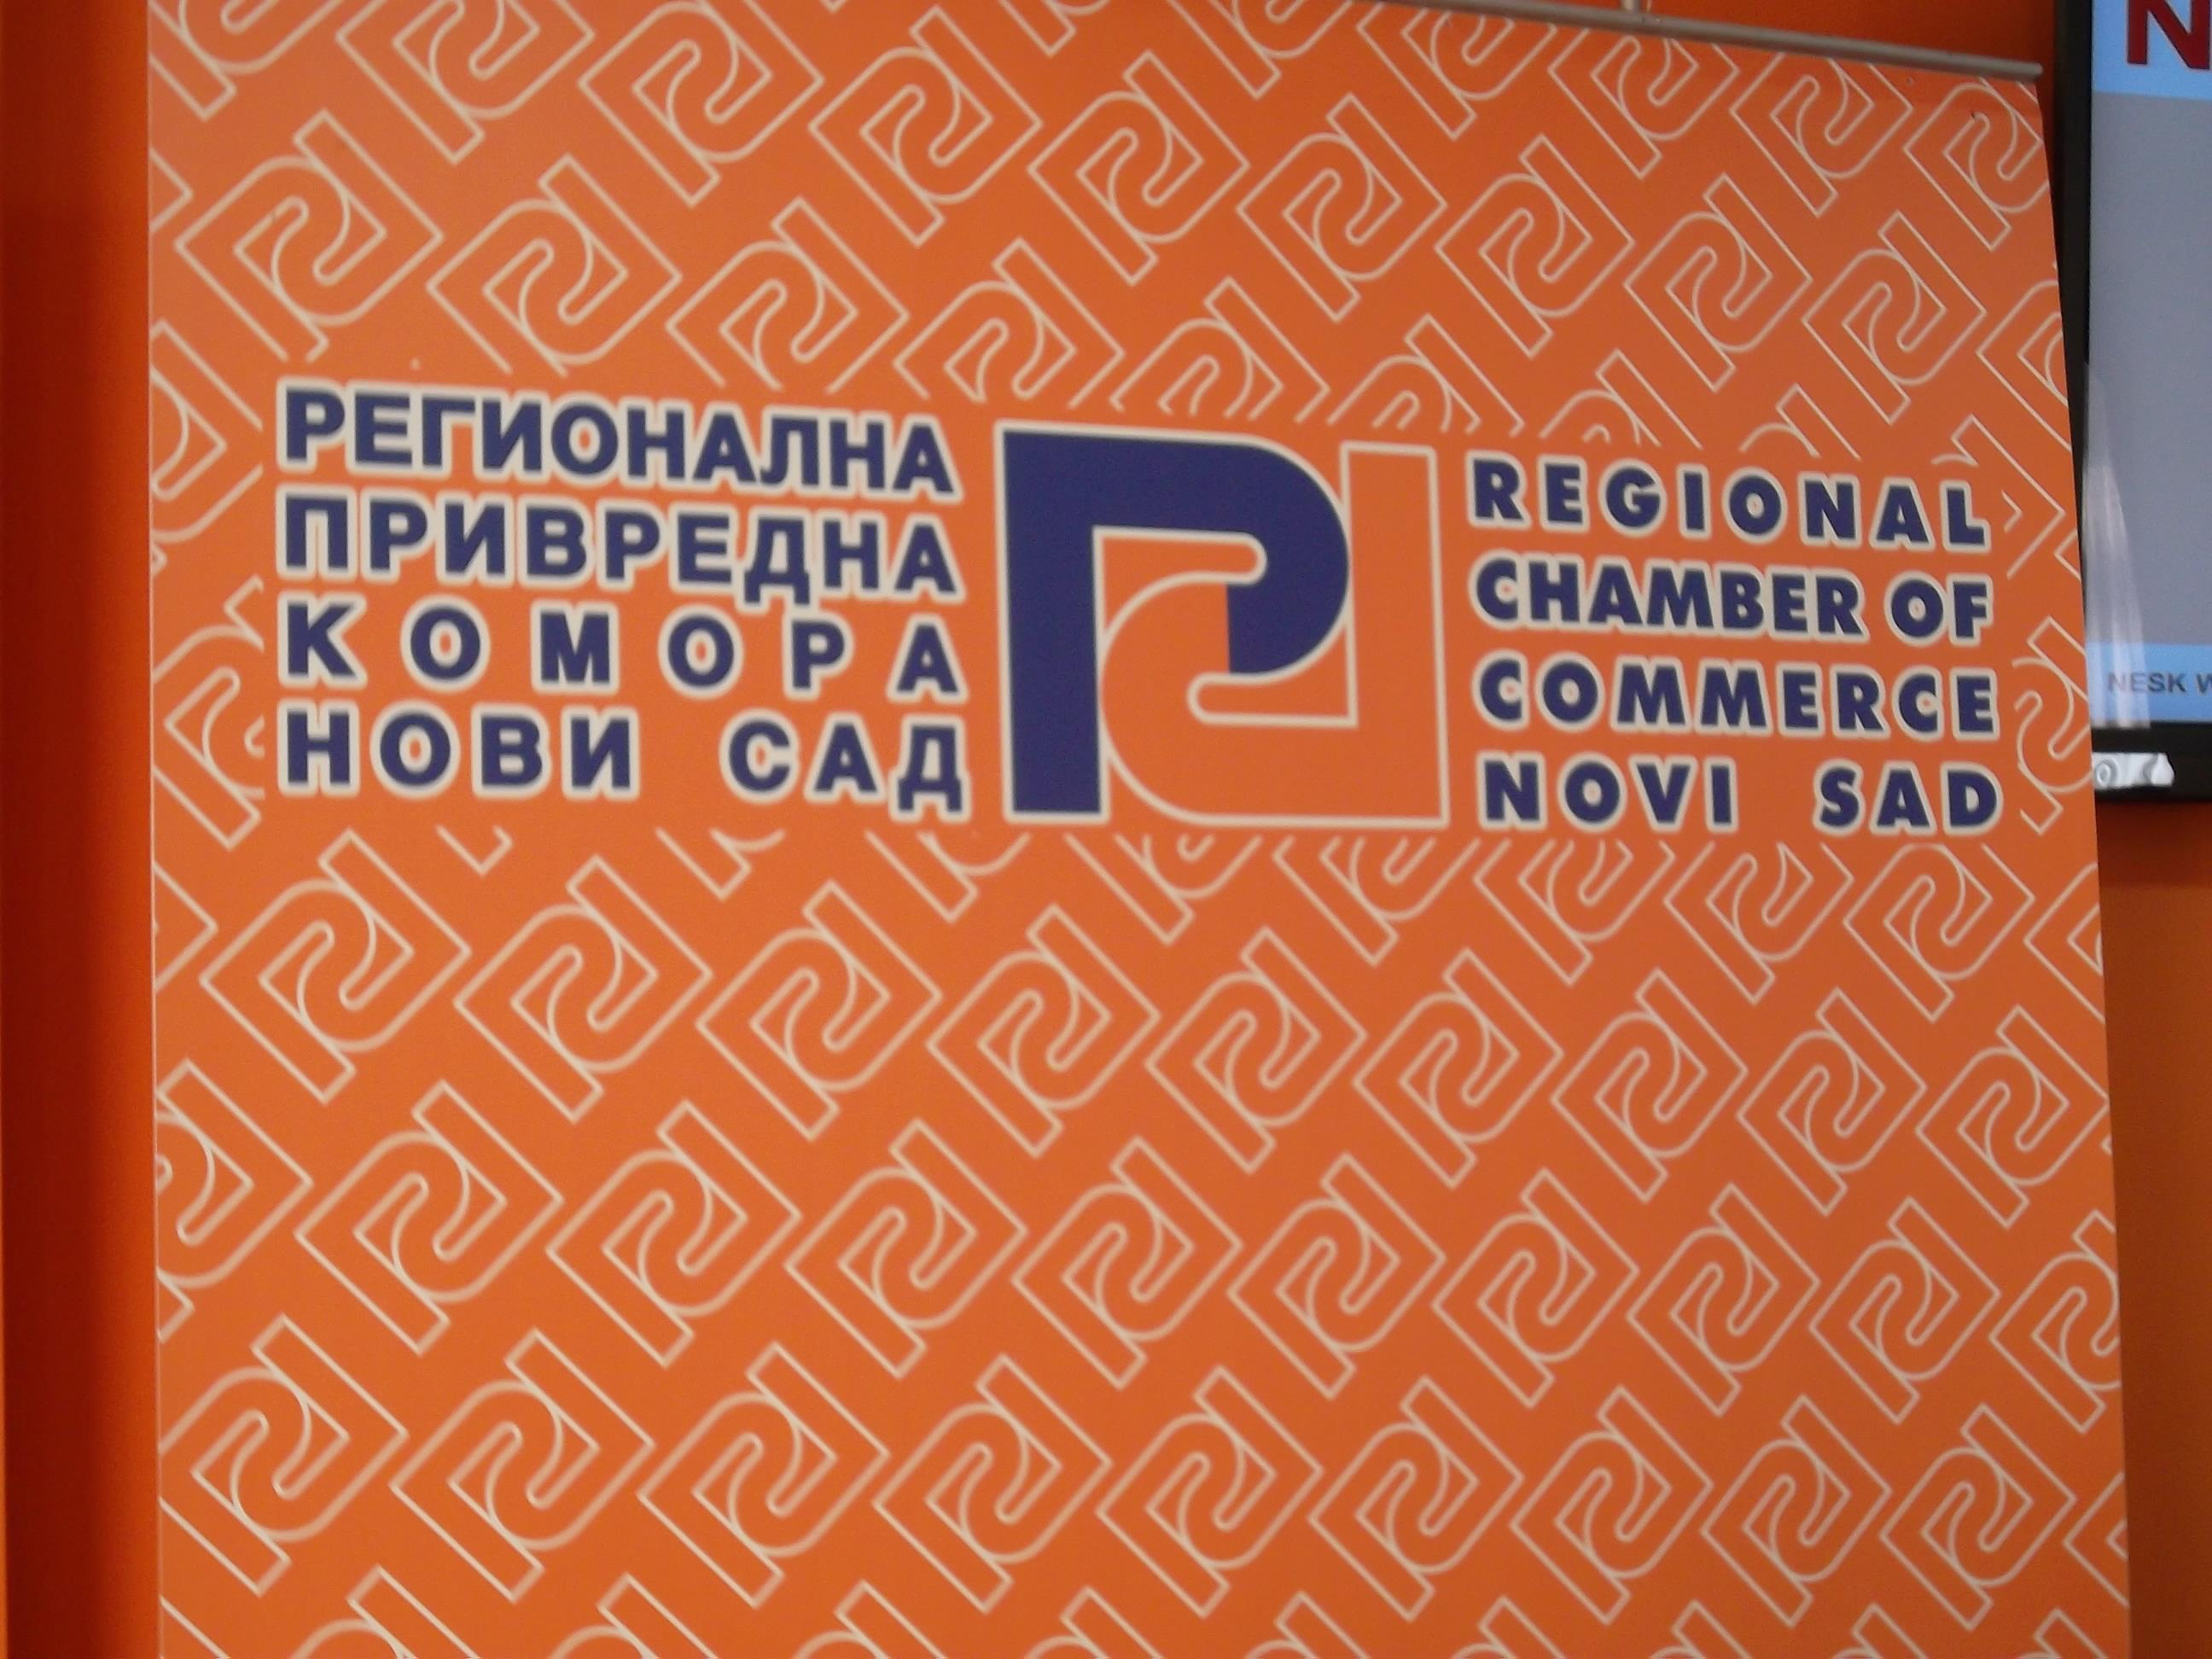 Regionalna privredna komora Novi Sad